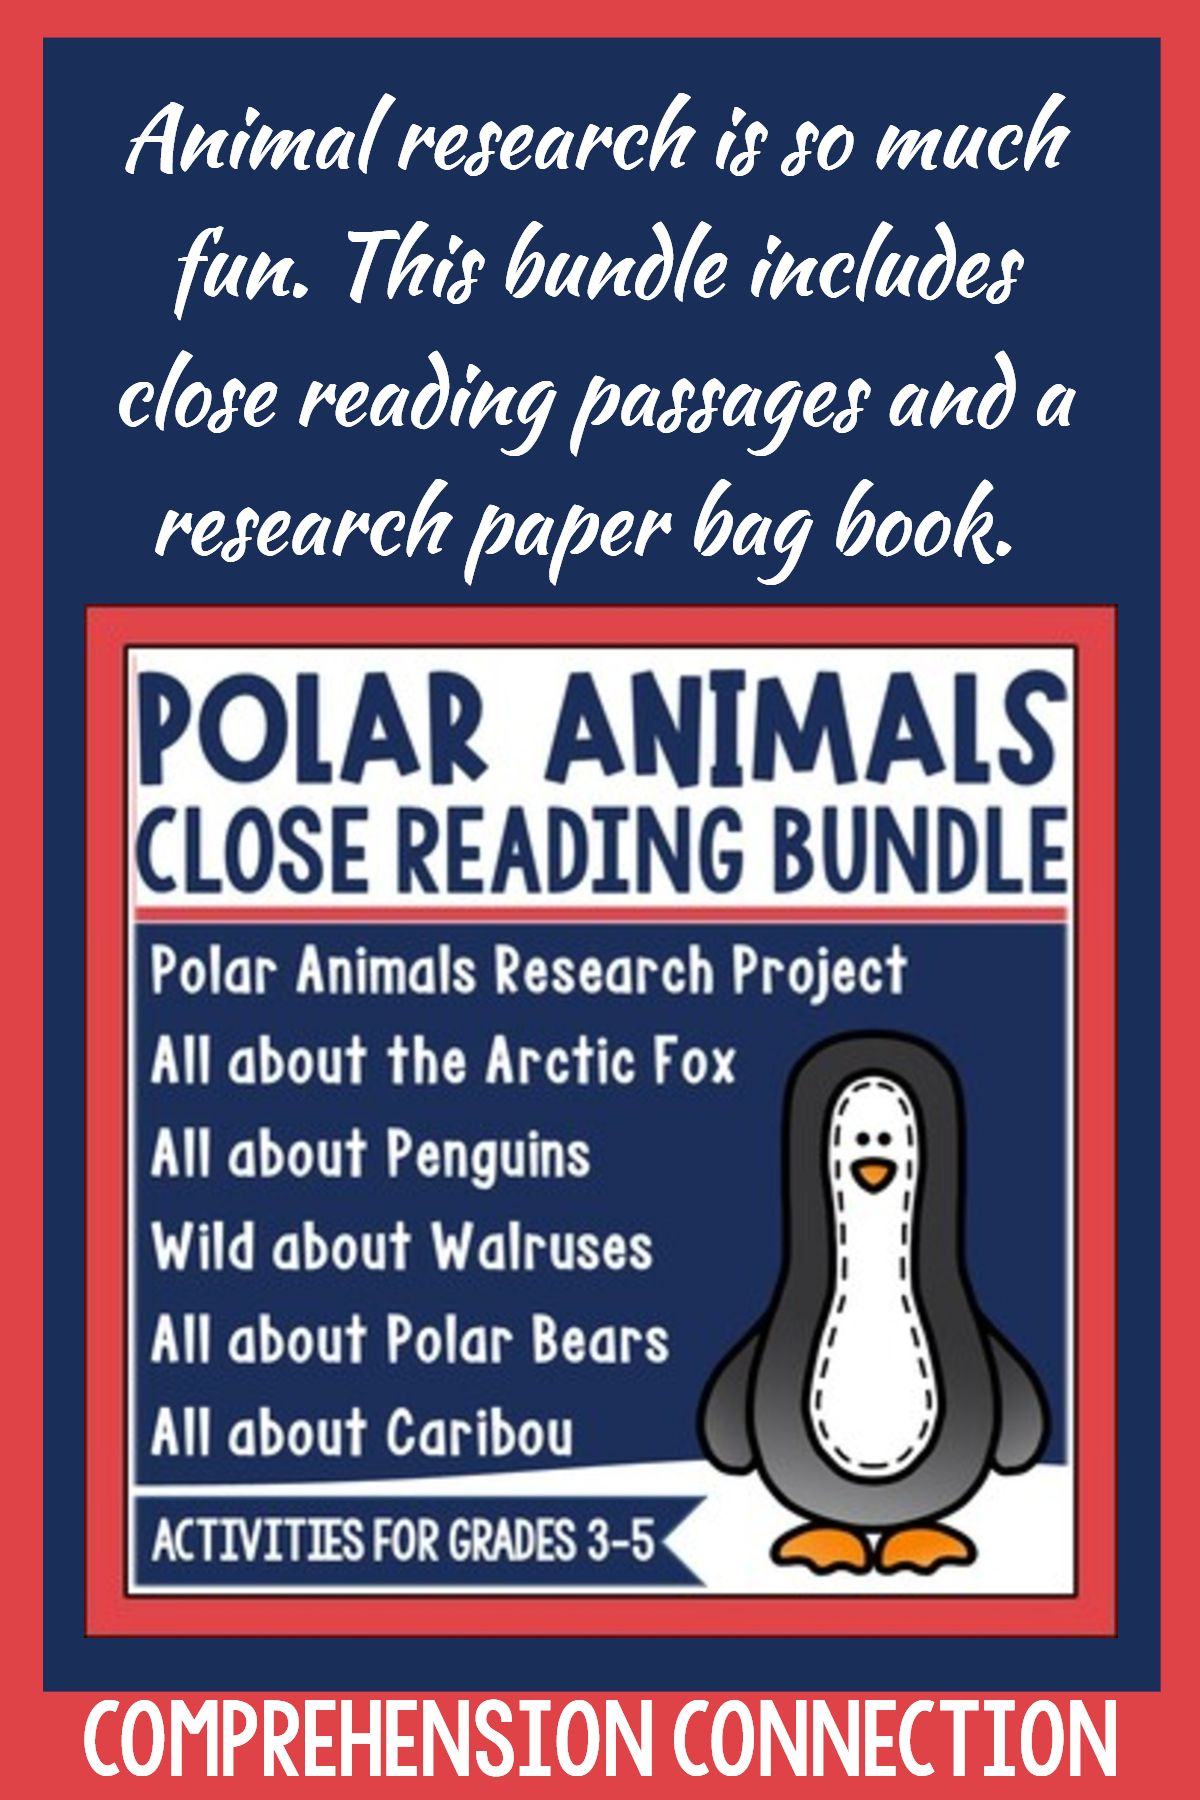 Polar Animal Close Reading Bundle